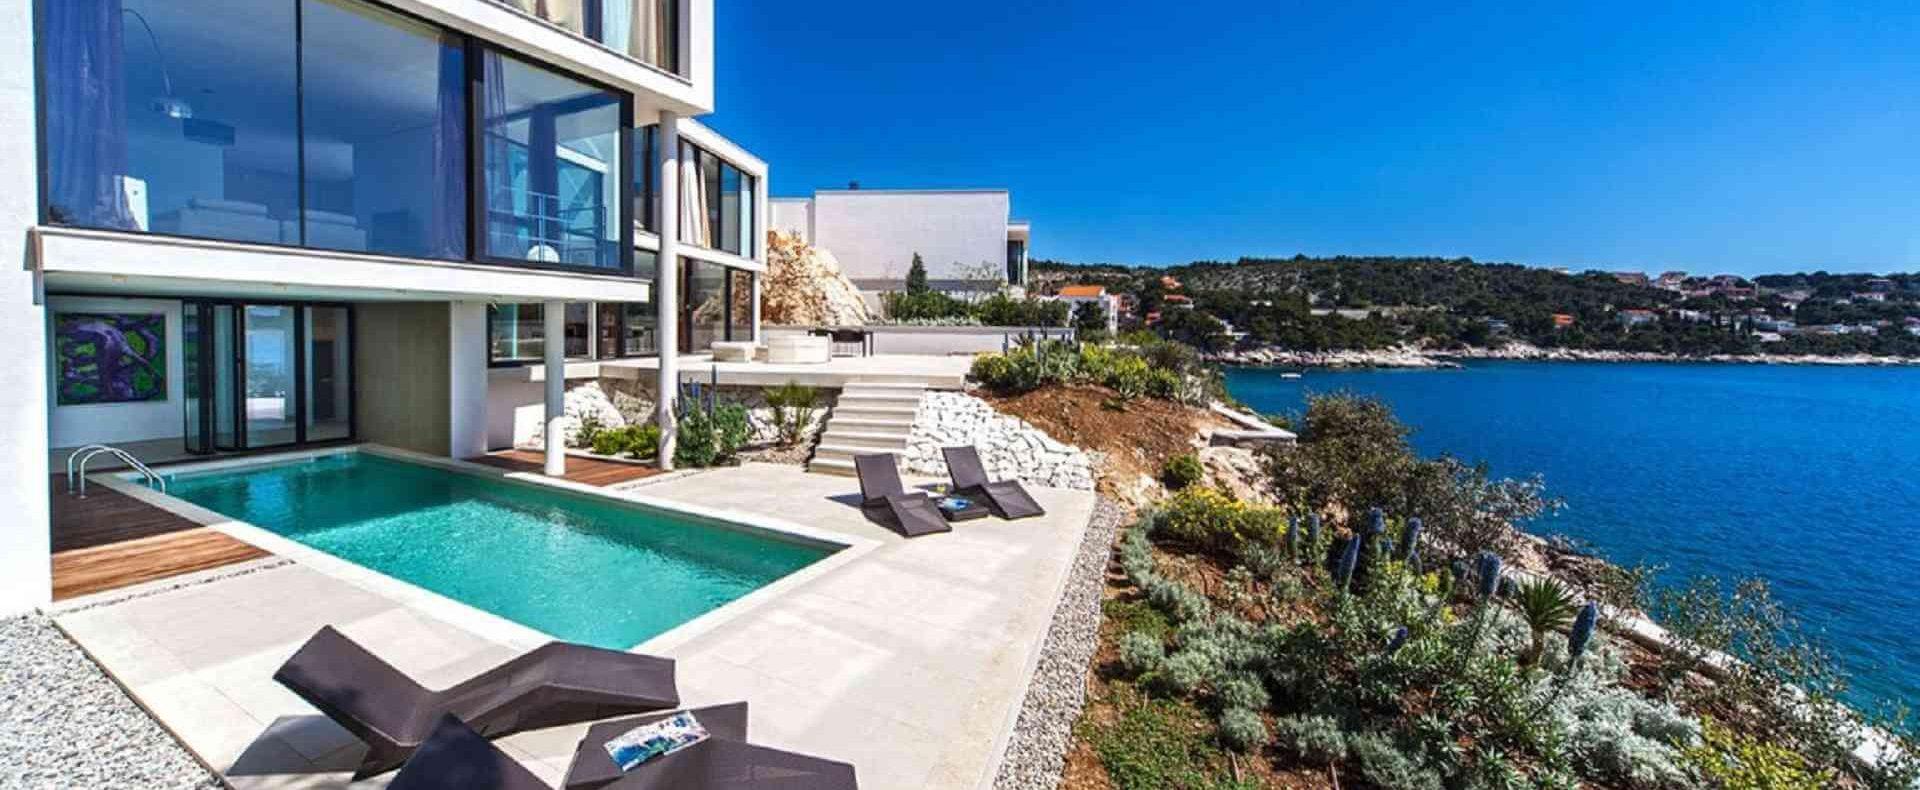 Luxury Villas in Croatia - indulge yourself